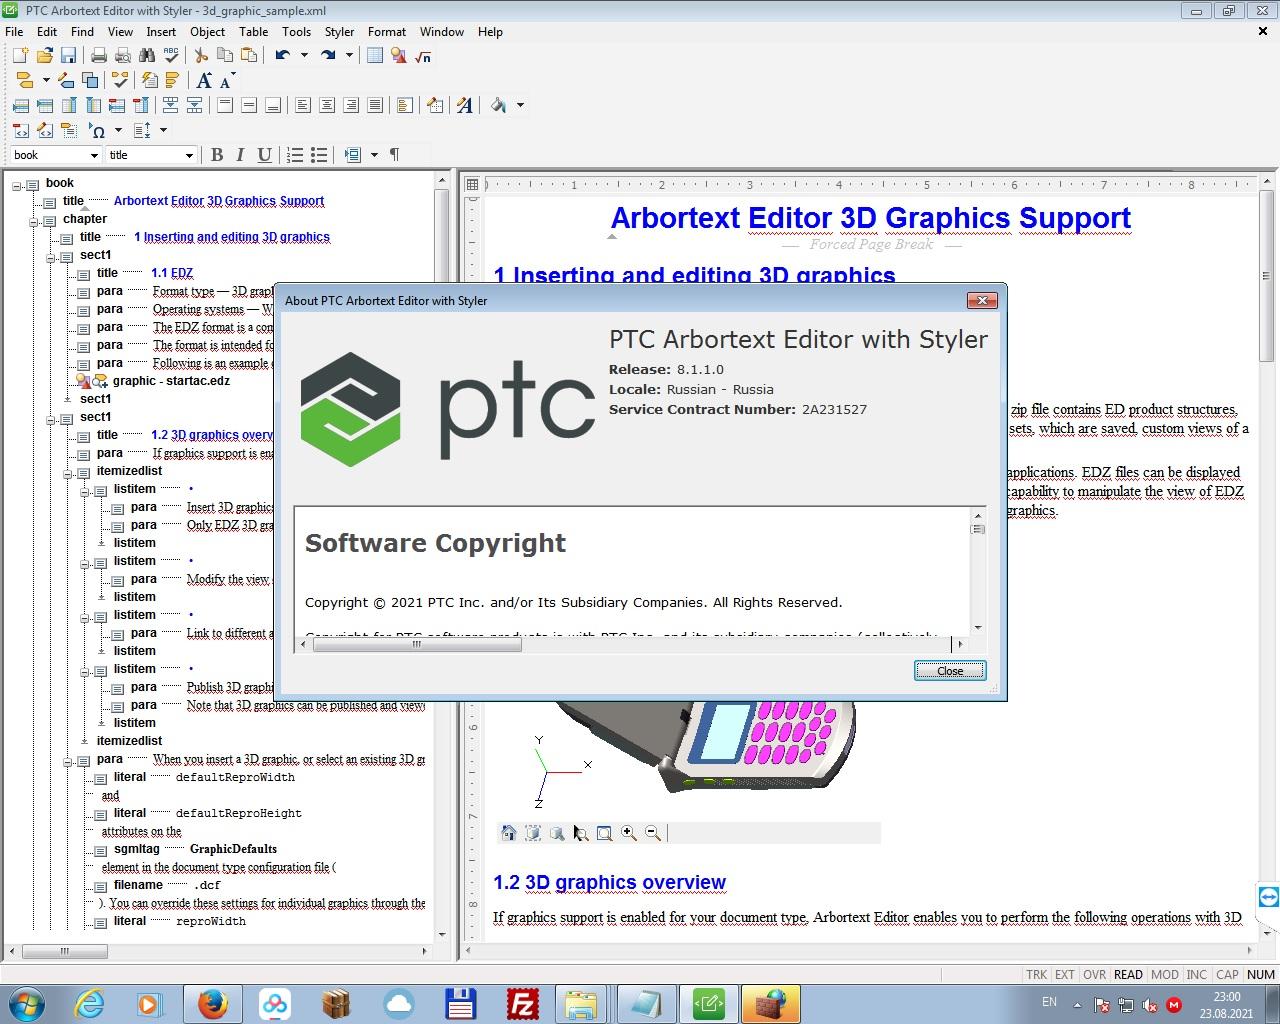 Working with PTC Arbortext Editor 8.1.1.0 full